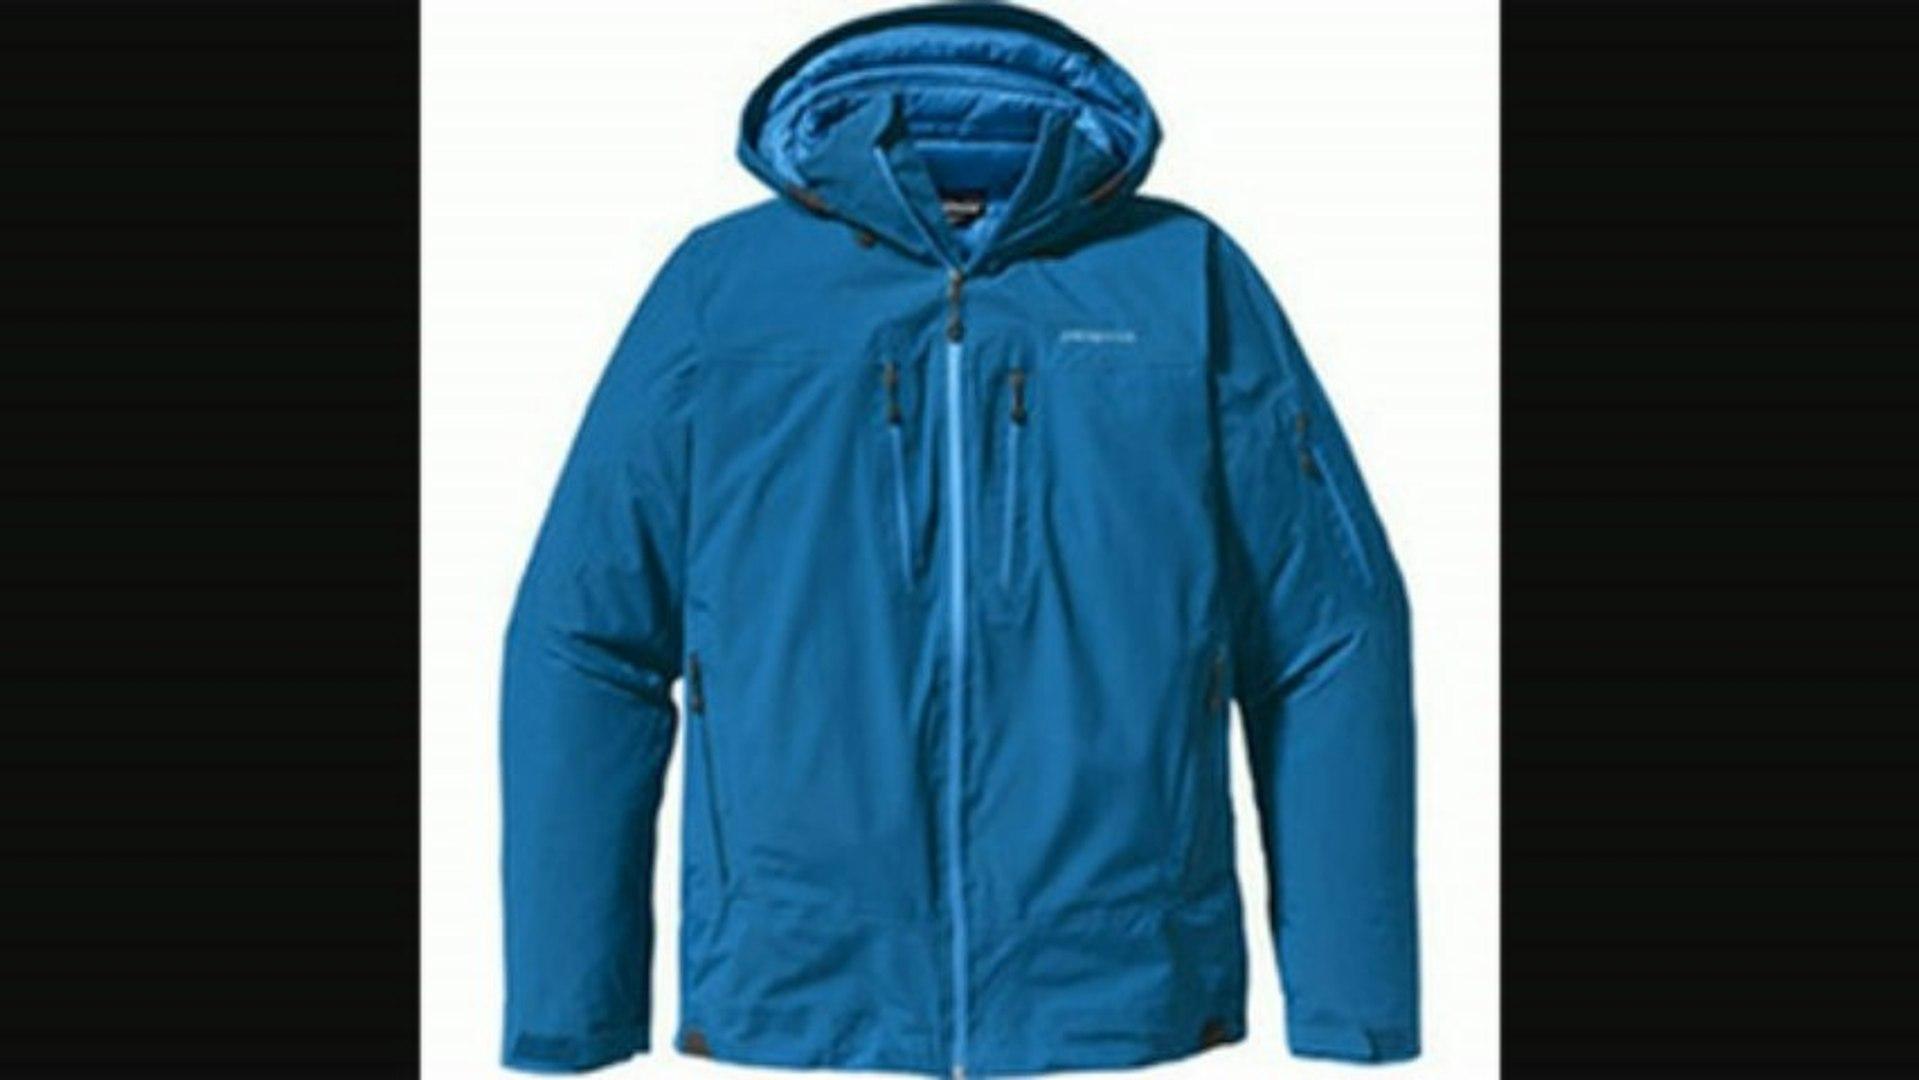 Patagonia  Primo Down Jacket 30470 (mens)  Bandana Blue Review